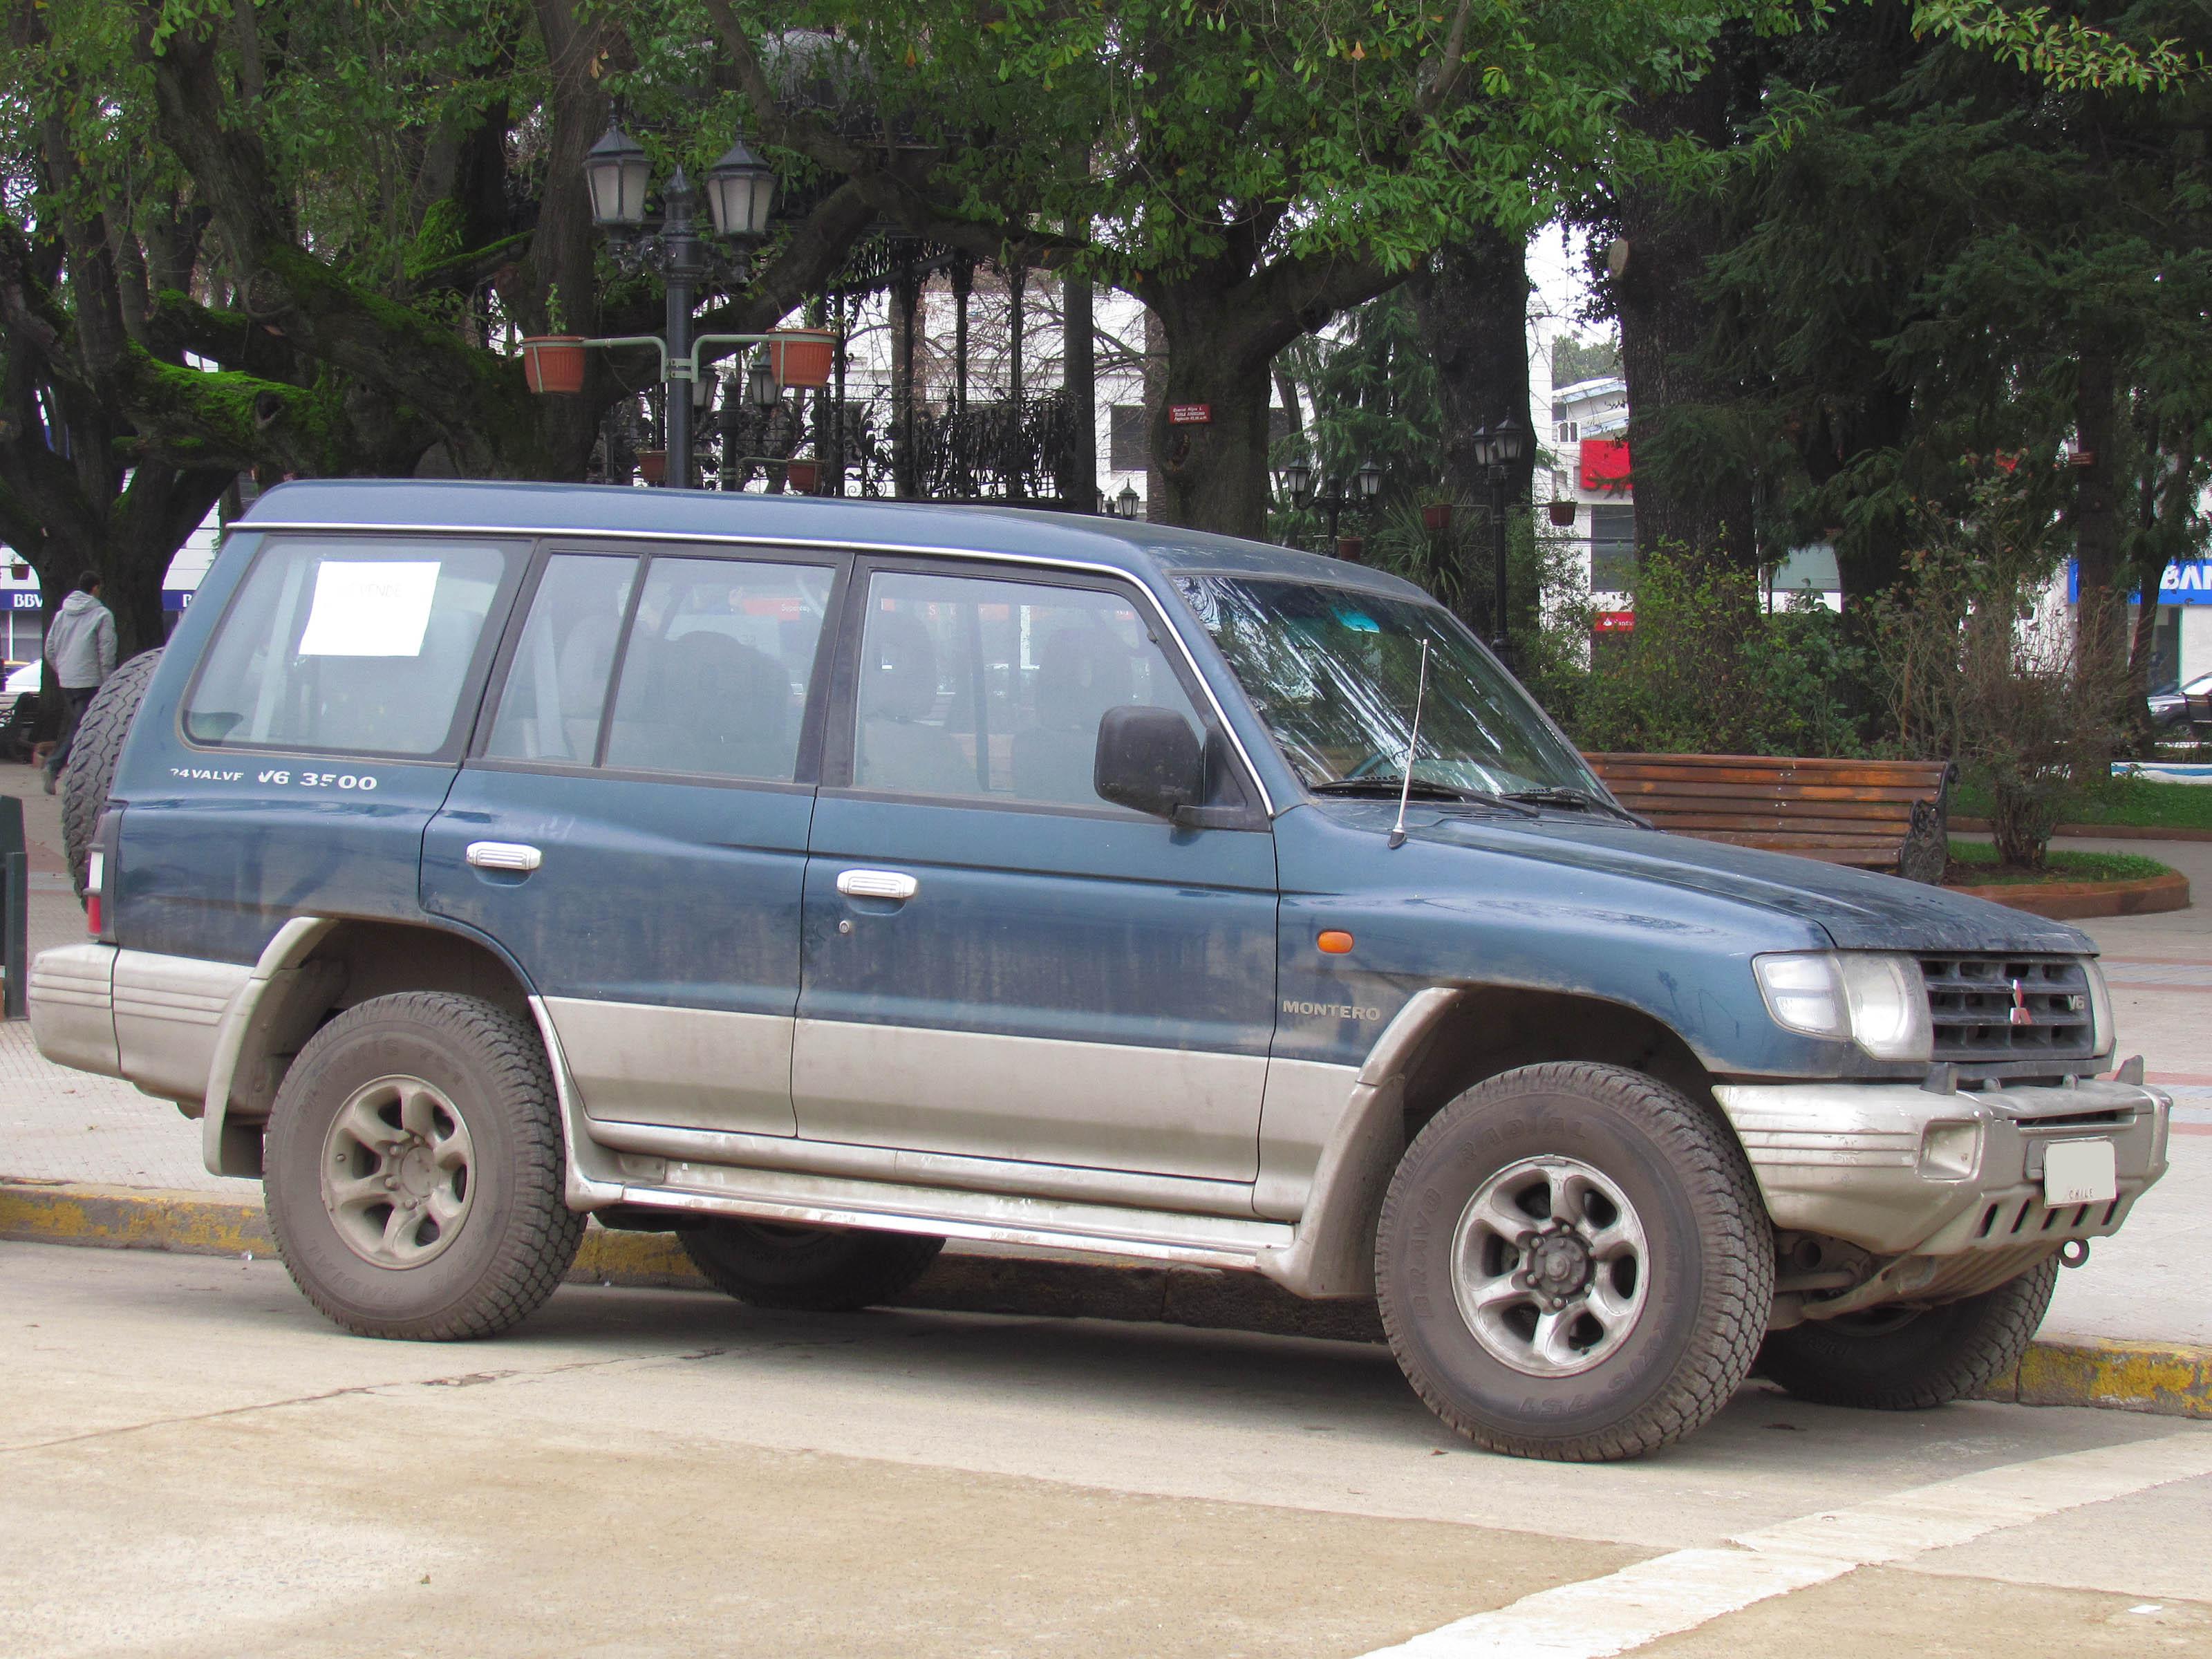 filemitsubishi montero gls v6 3500 1998 13897533347jpg - Mitsubishi Montero 1998